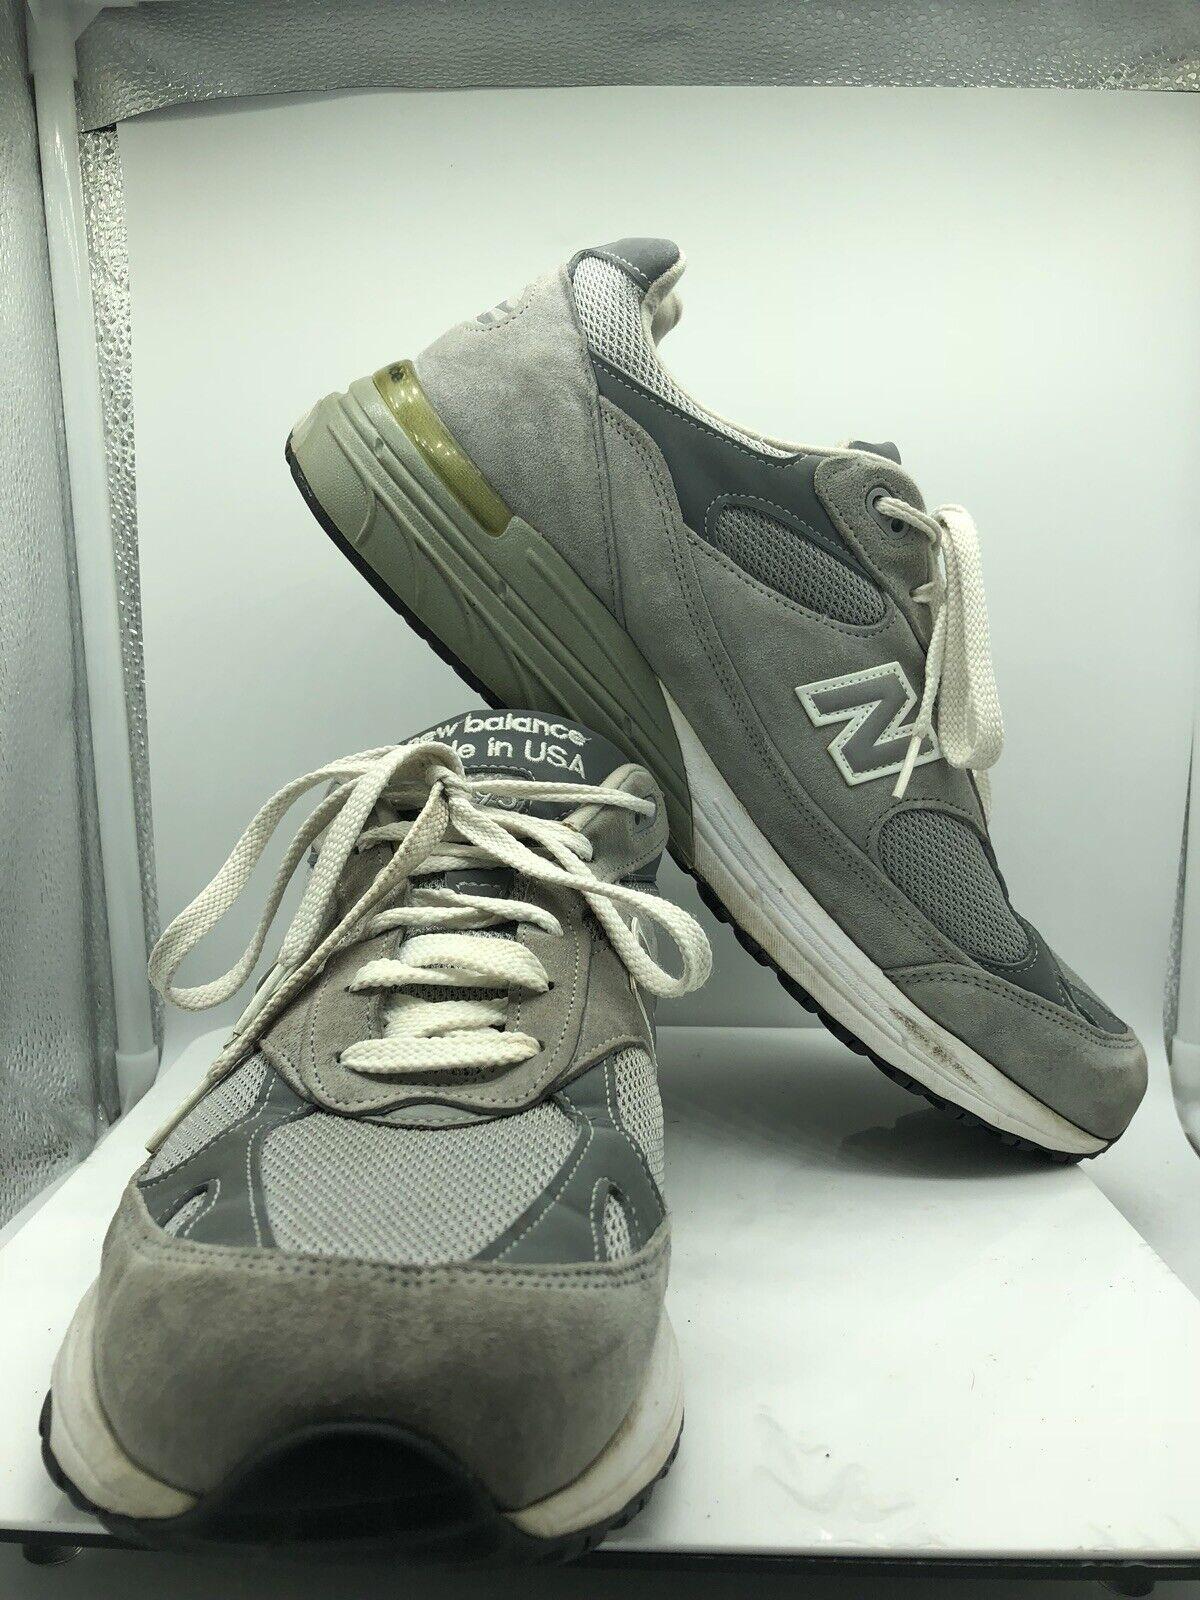 New para hombre Classic 993 correr Balance Zapatos Tenis Atléticas con Cordones gris